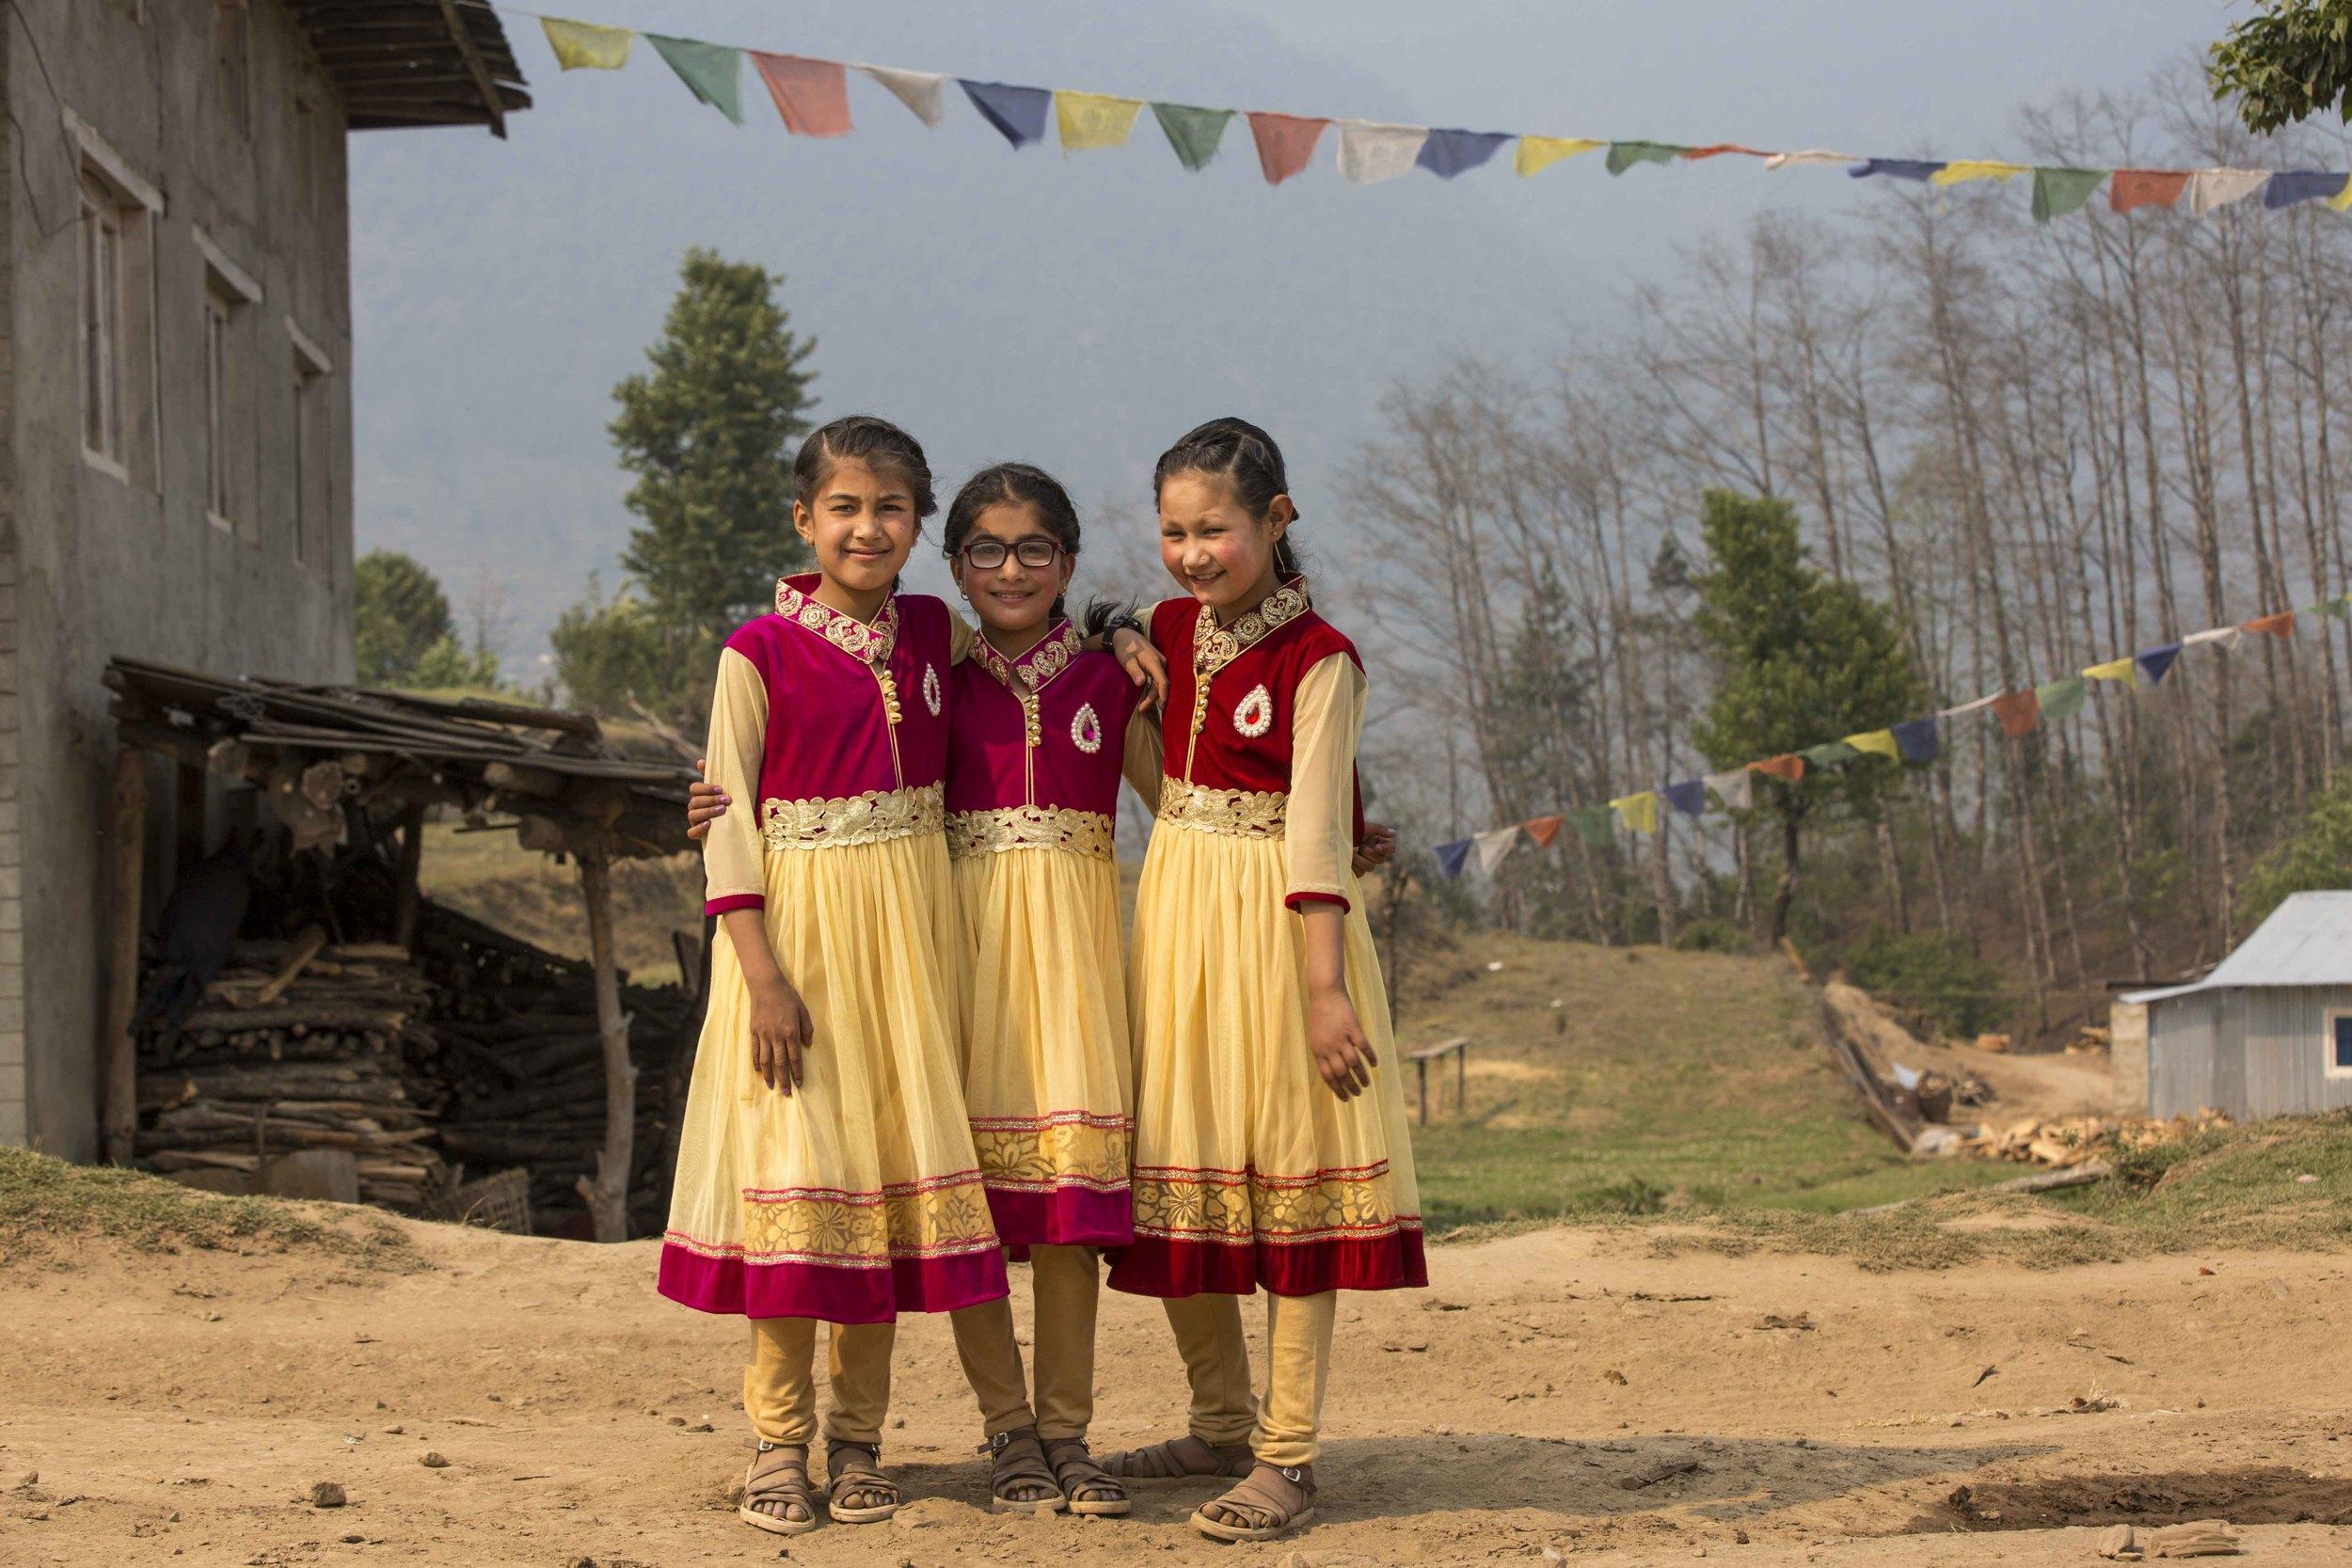 Nepal photos website updates (1 of 1)-2.jpg